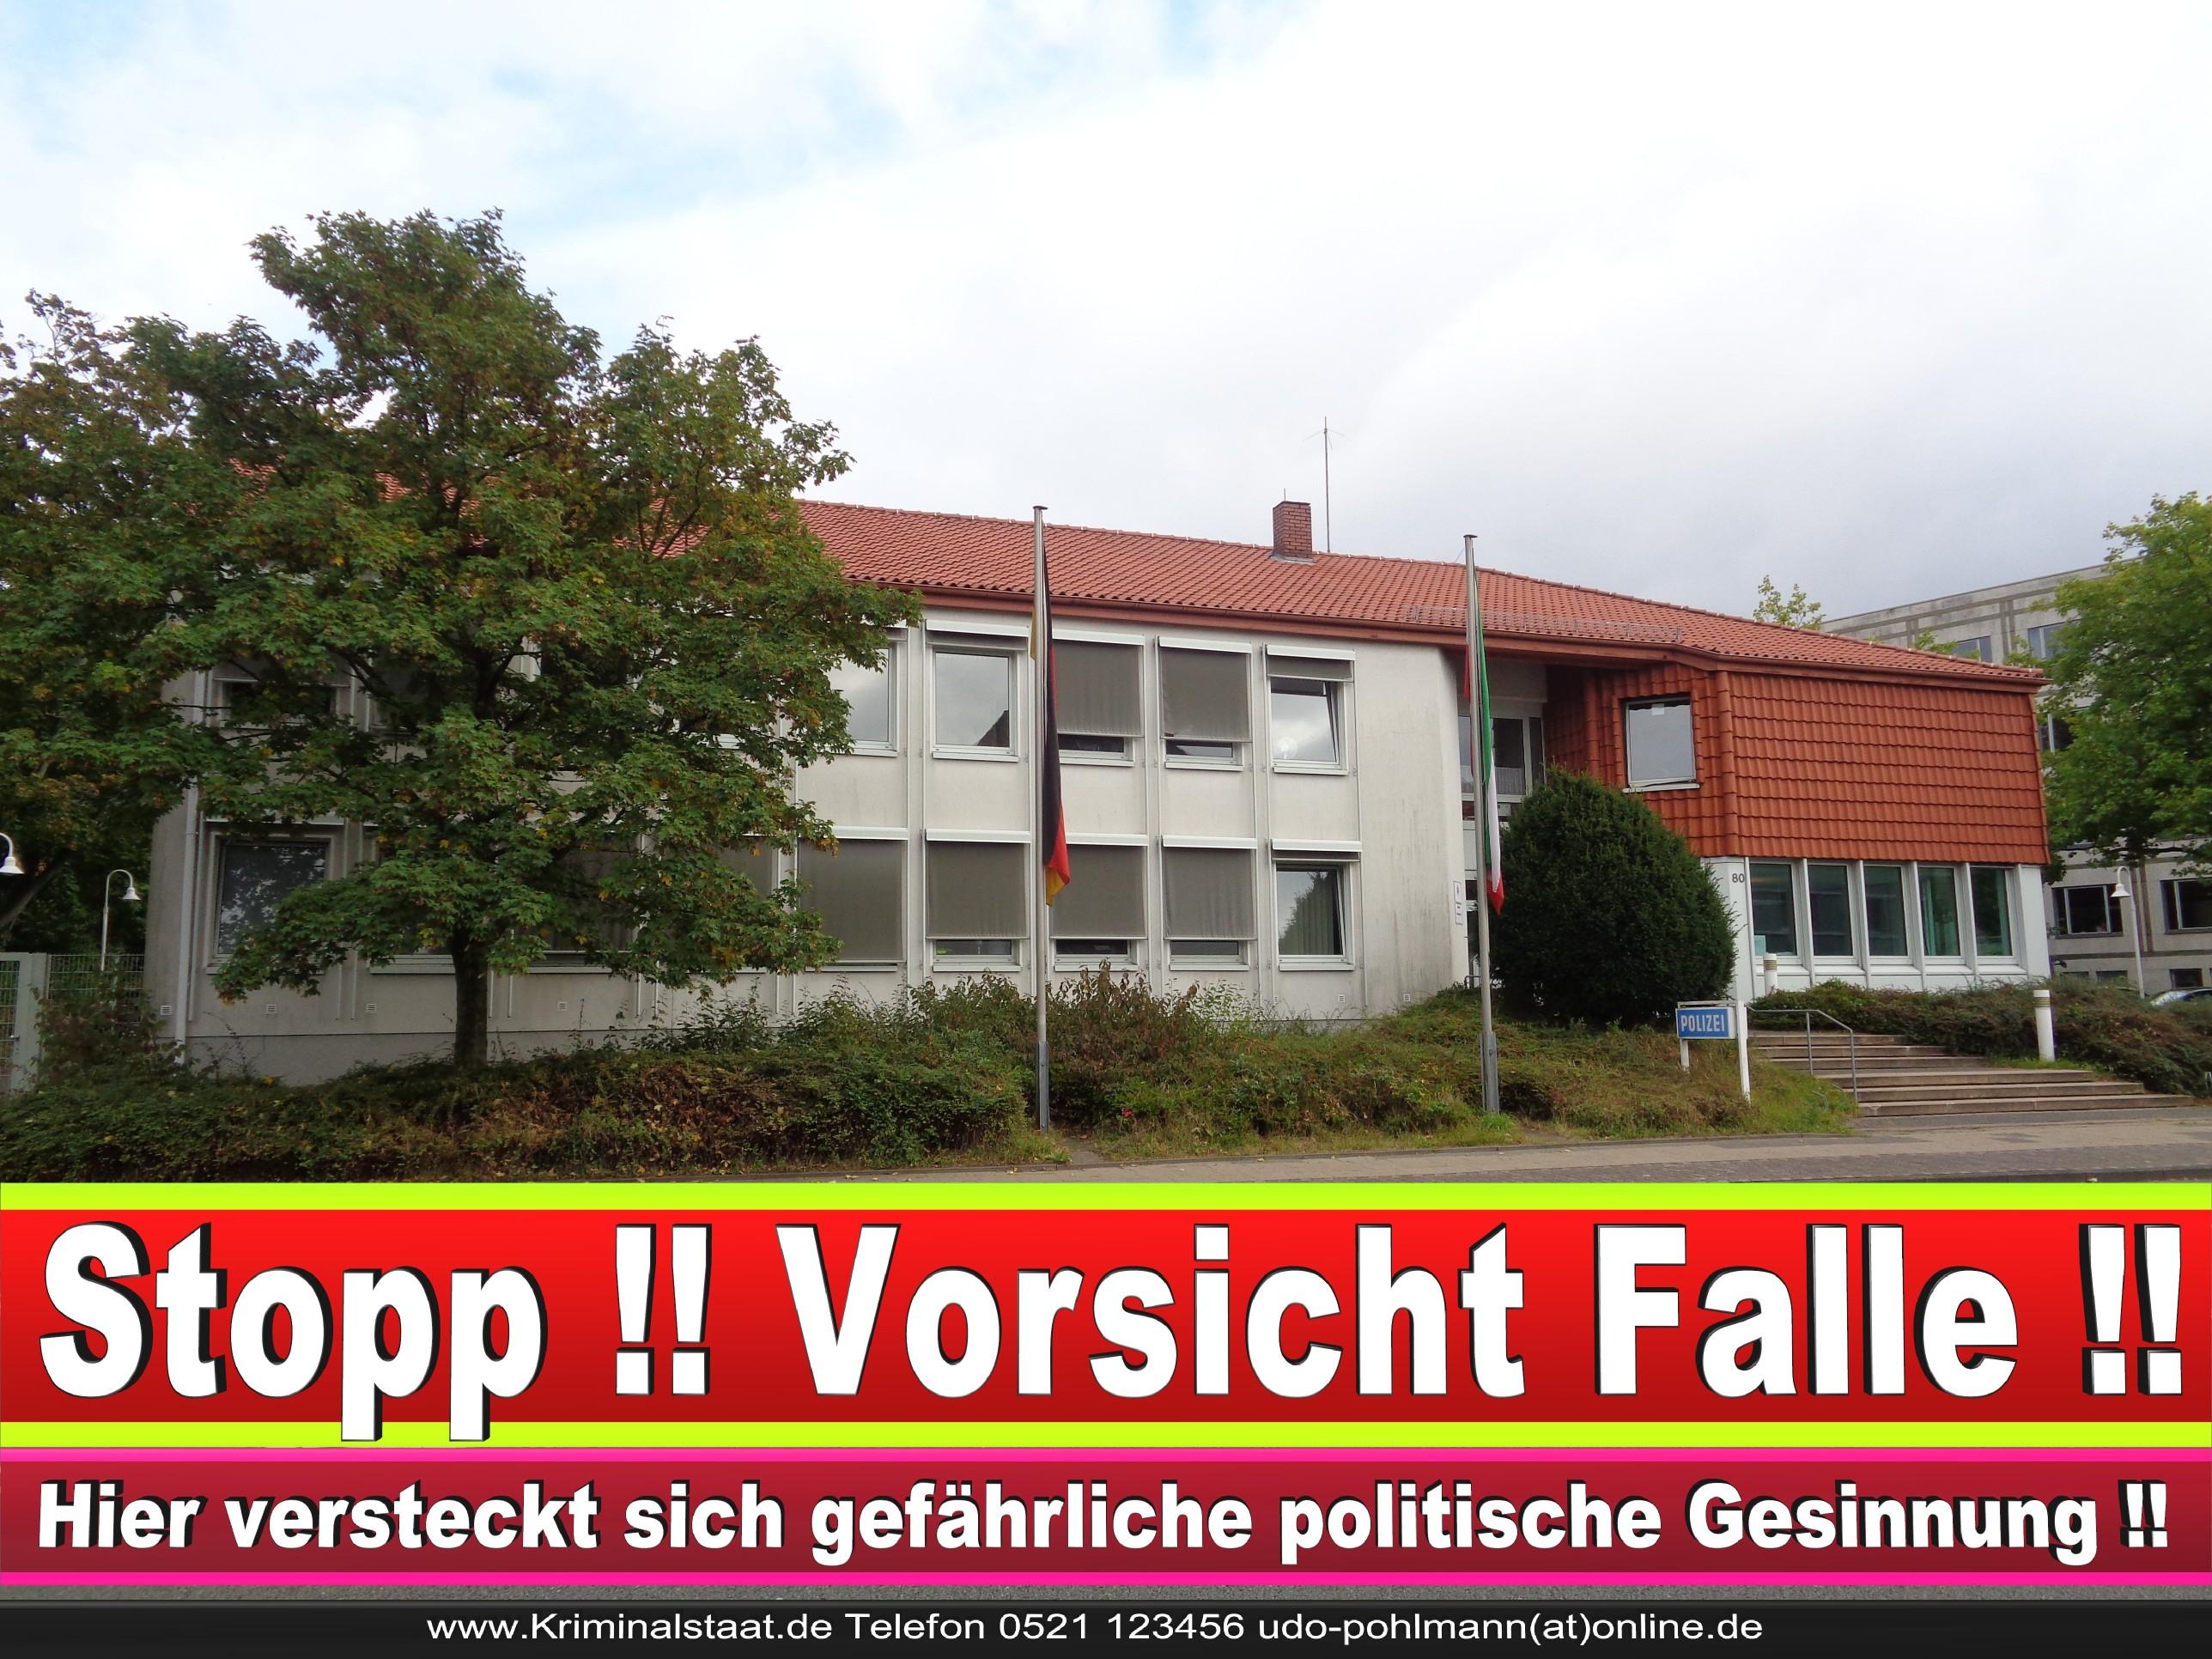 Polizei Brackwede Bielefeld Süd Ost Mitte Korruption In Bielefeld (3)